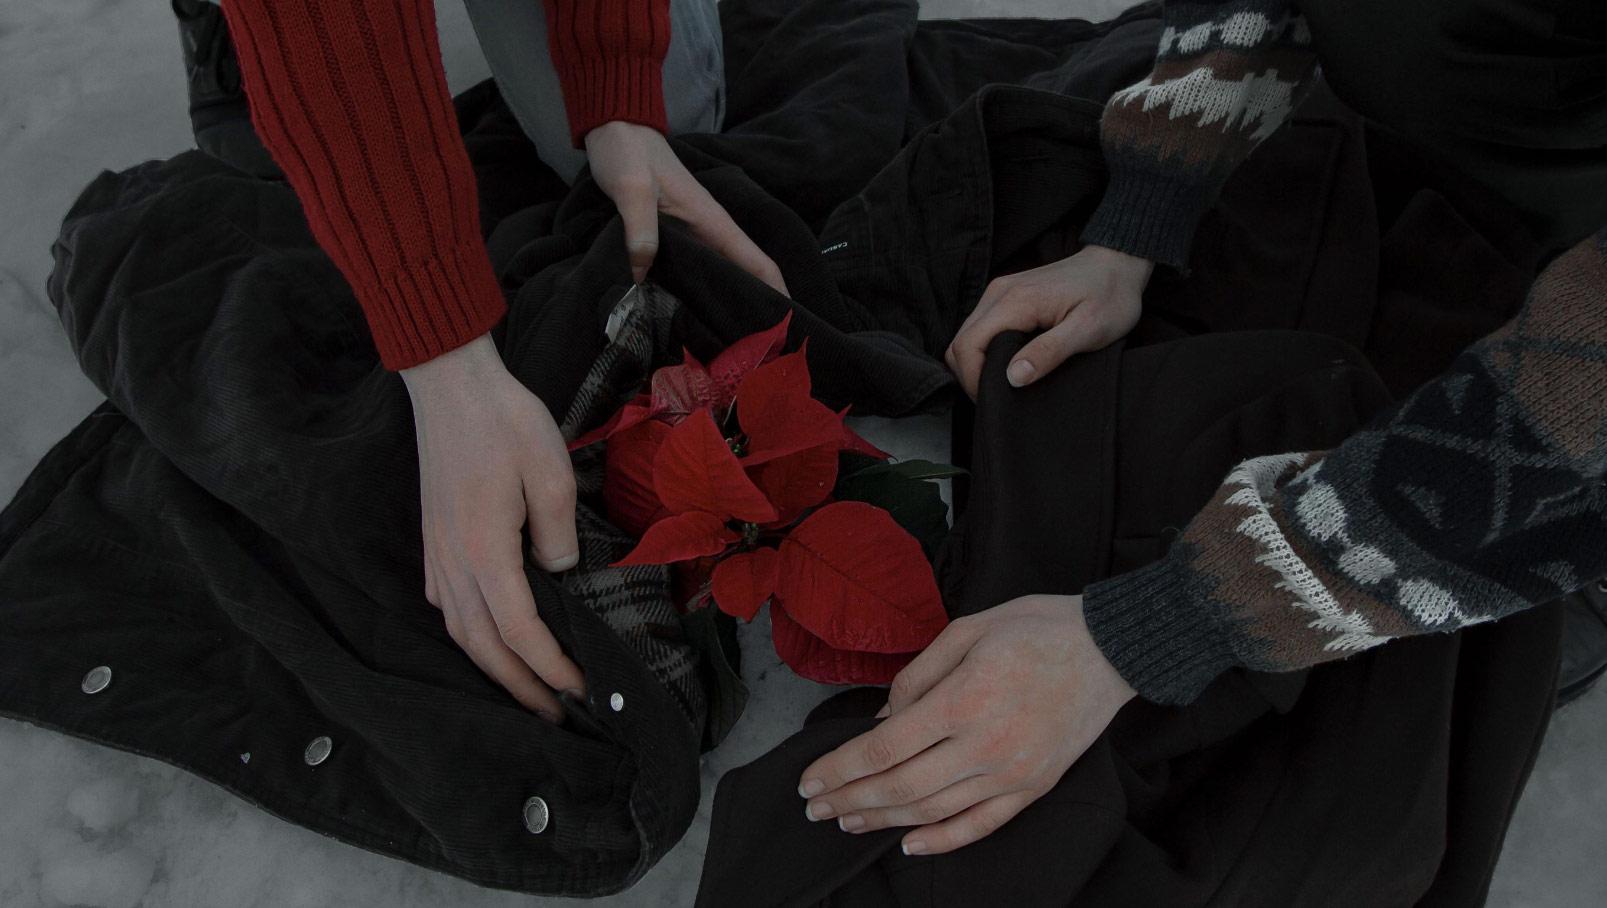 Цветок надежды, © Валерия Сагура и Андрей Шурпин, Номинация «Фотоистория без текста», Конкурс фоторепортажей CINE-BOOKS